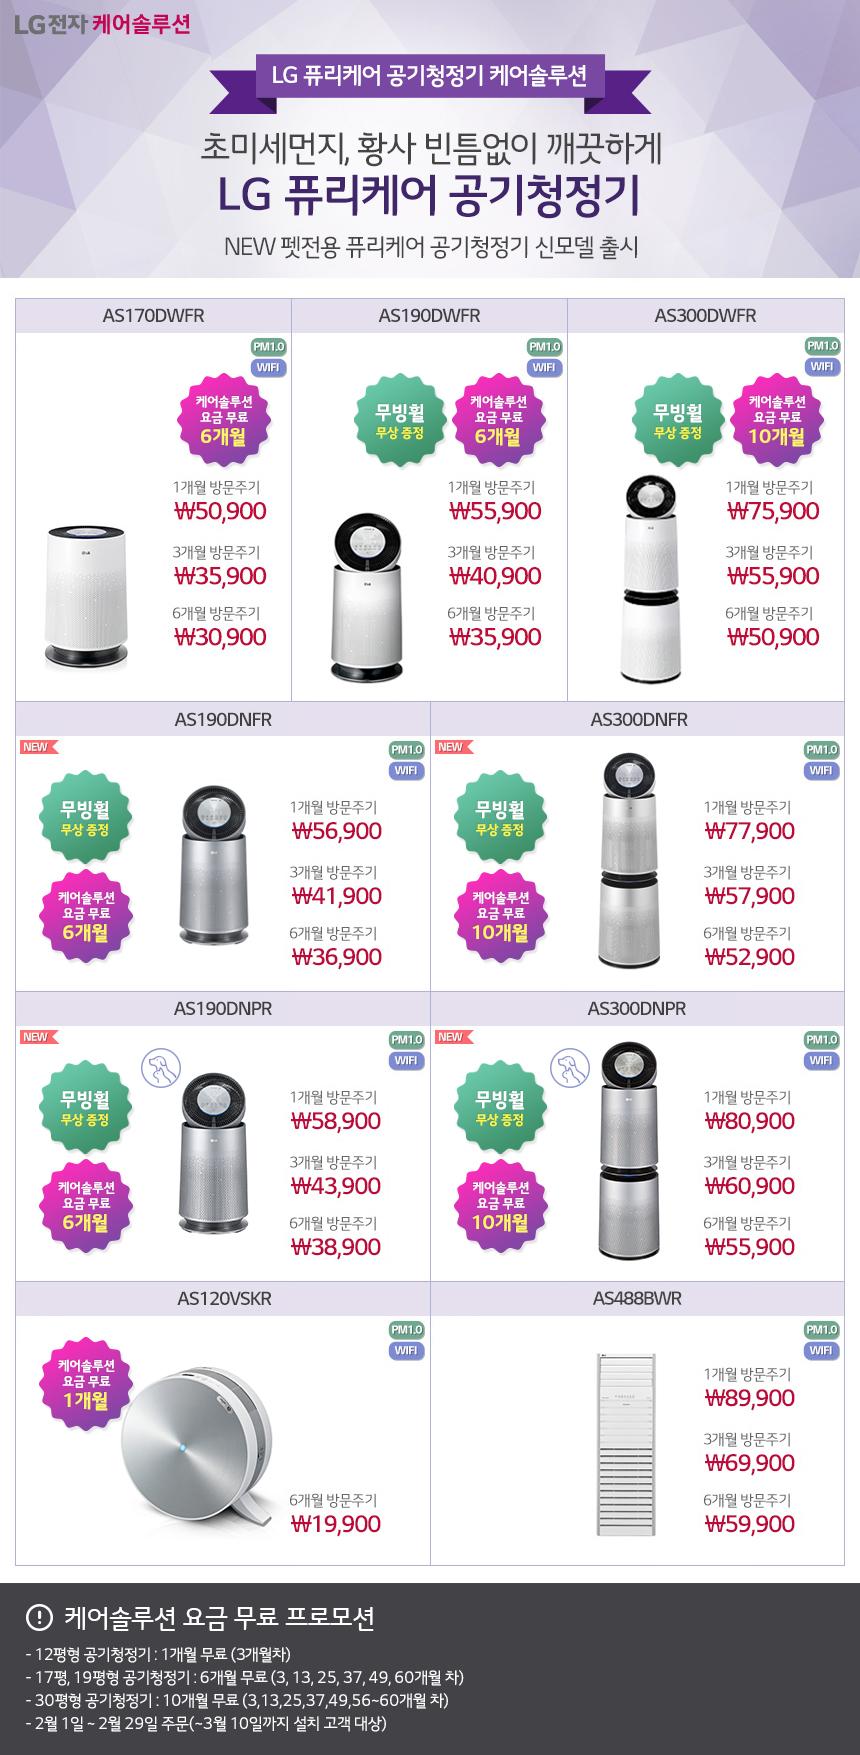 [USP 배너 - 판촉] 2월 LG 퓨리케어 공기청정기 프로모션.jpg